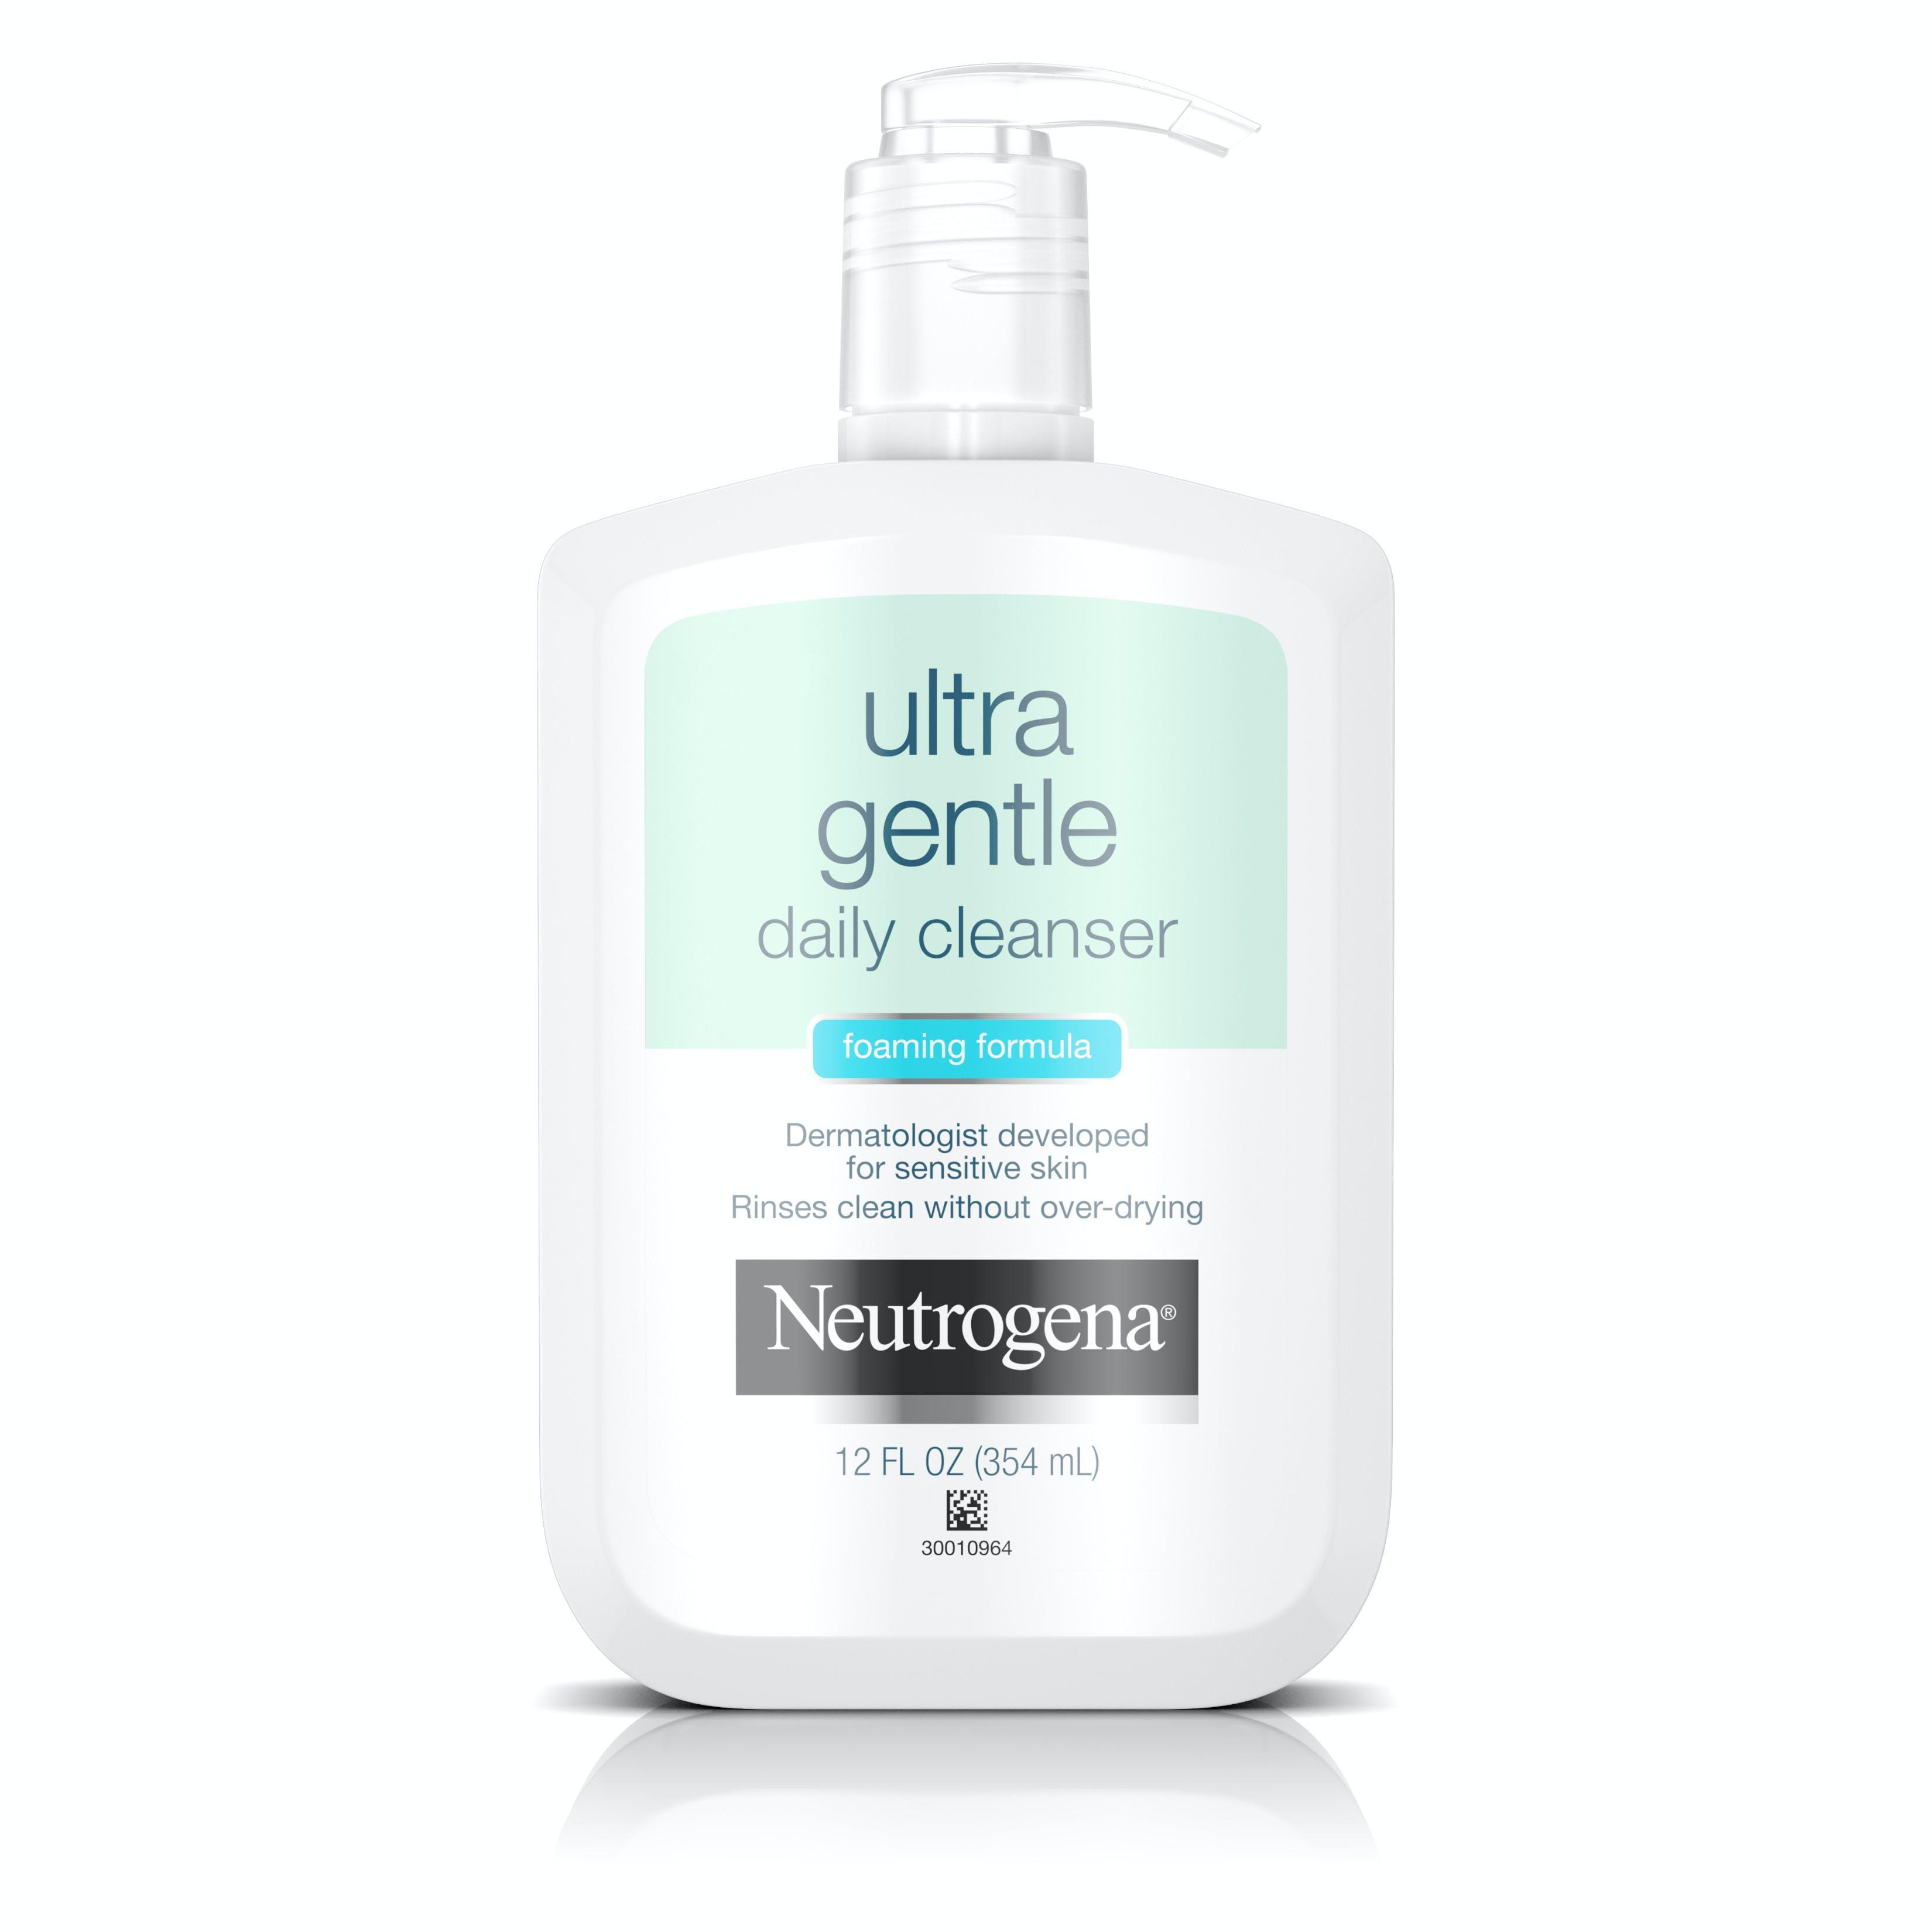 neutrogena skin cleanser